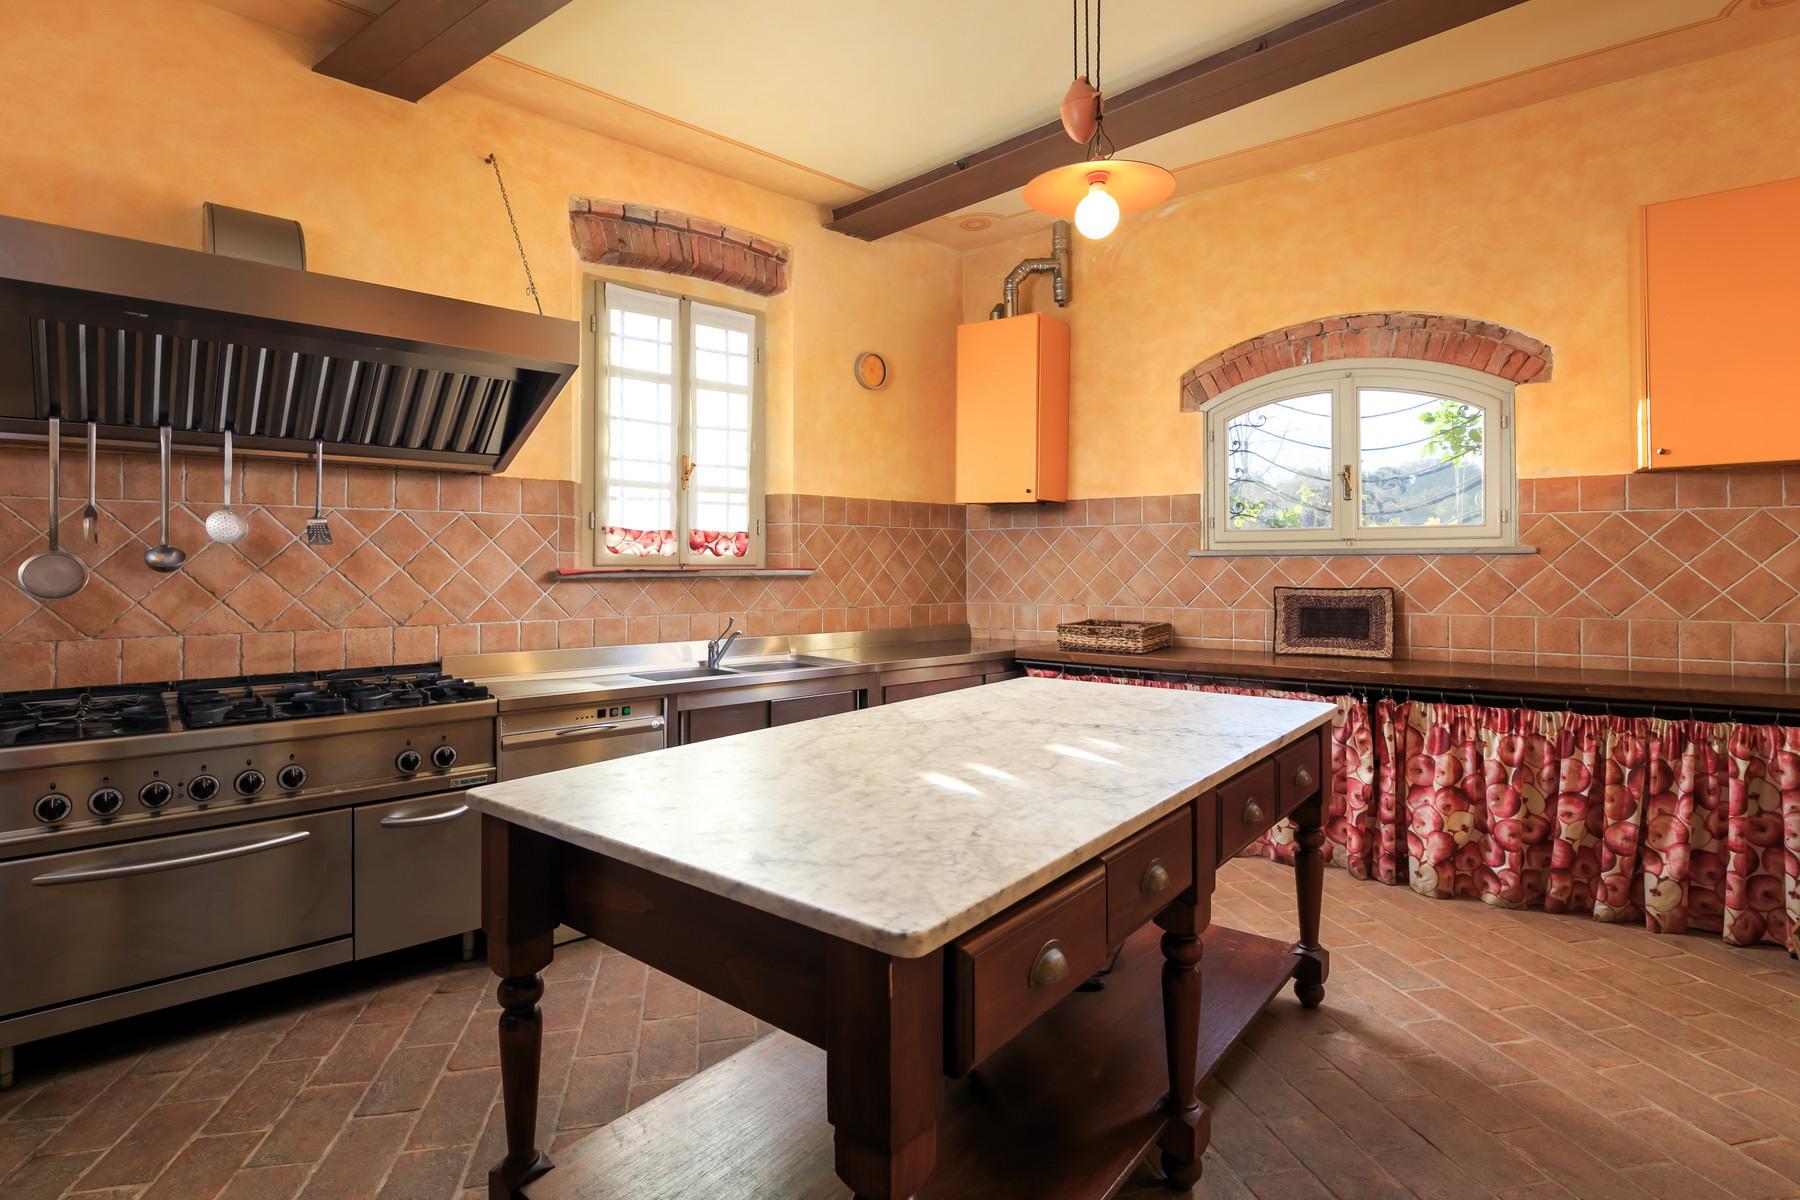 Villa in Vendita a Casciana Terme Lari: 5 locali, 550 mq - Foto 22